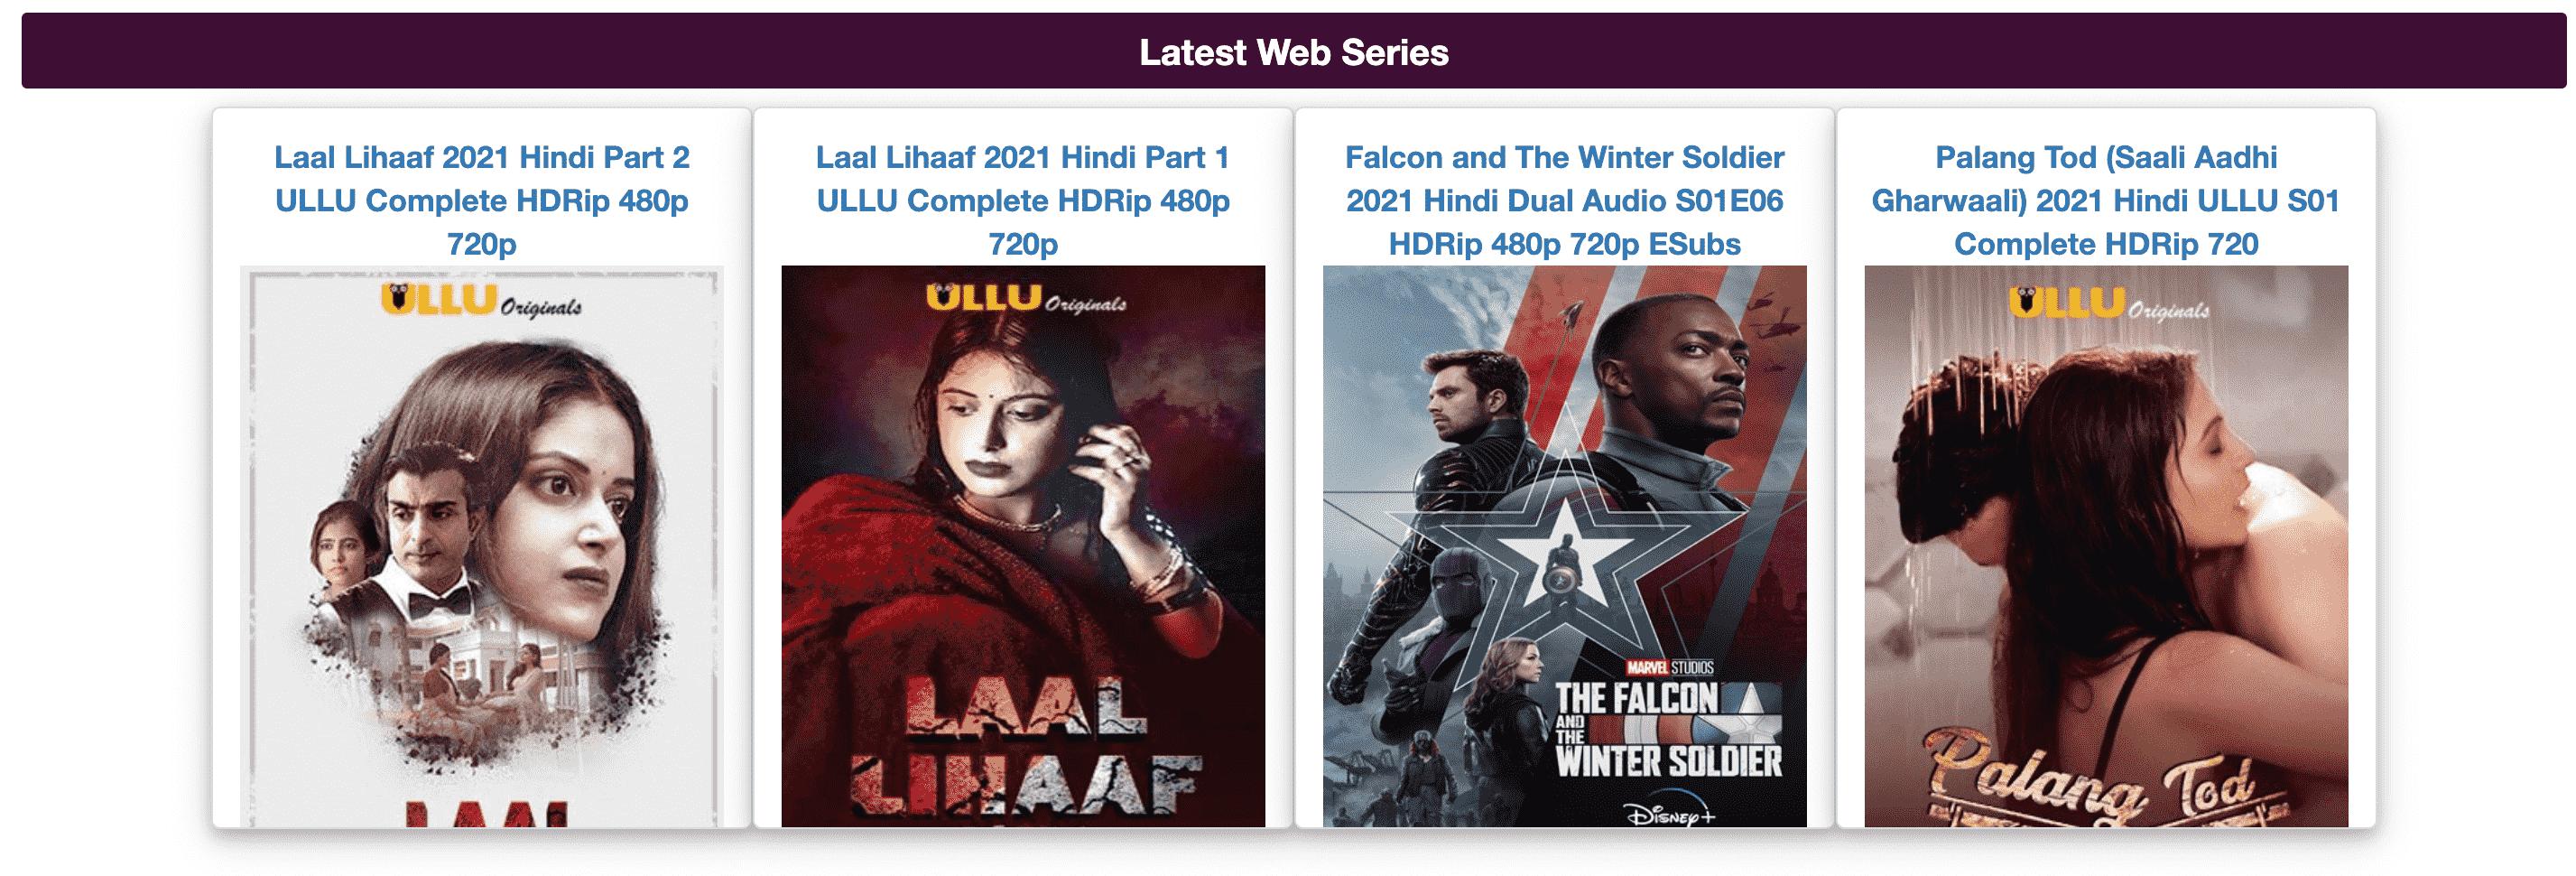 Movie4me Latest Web Series